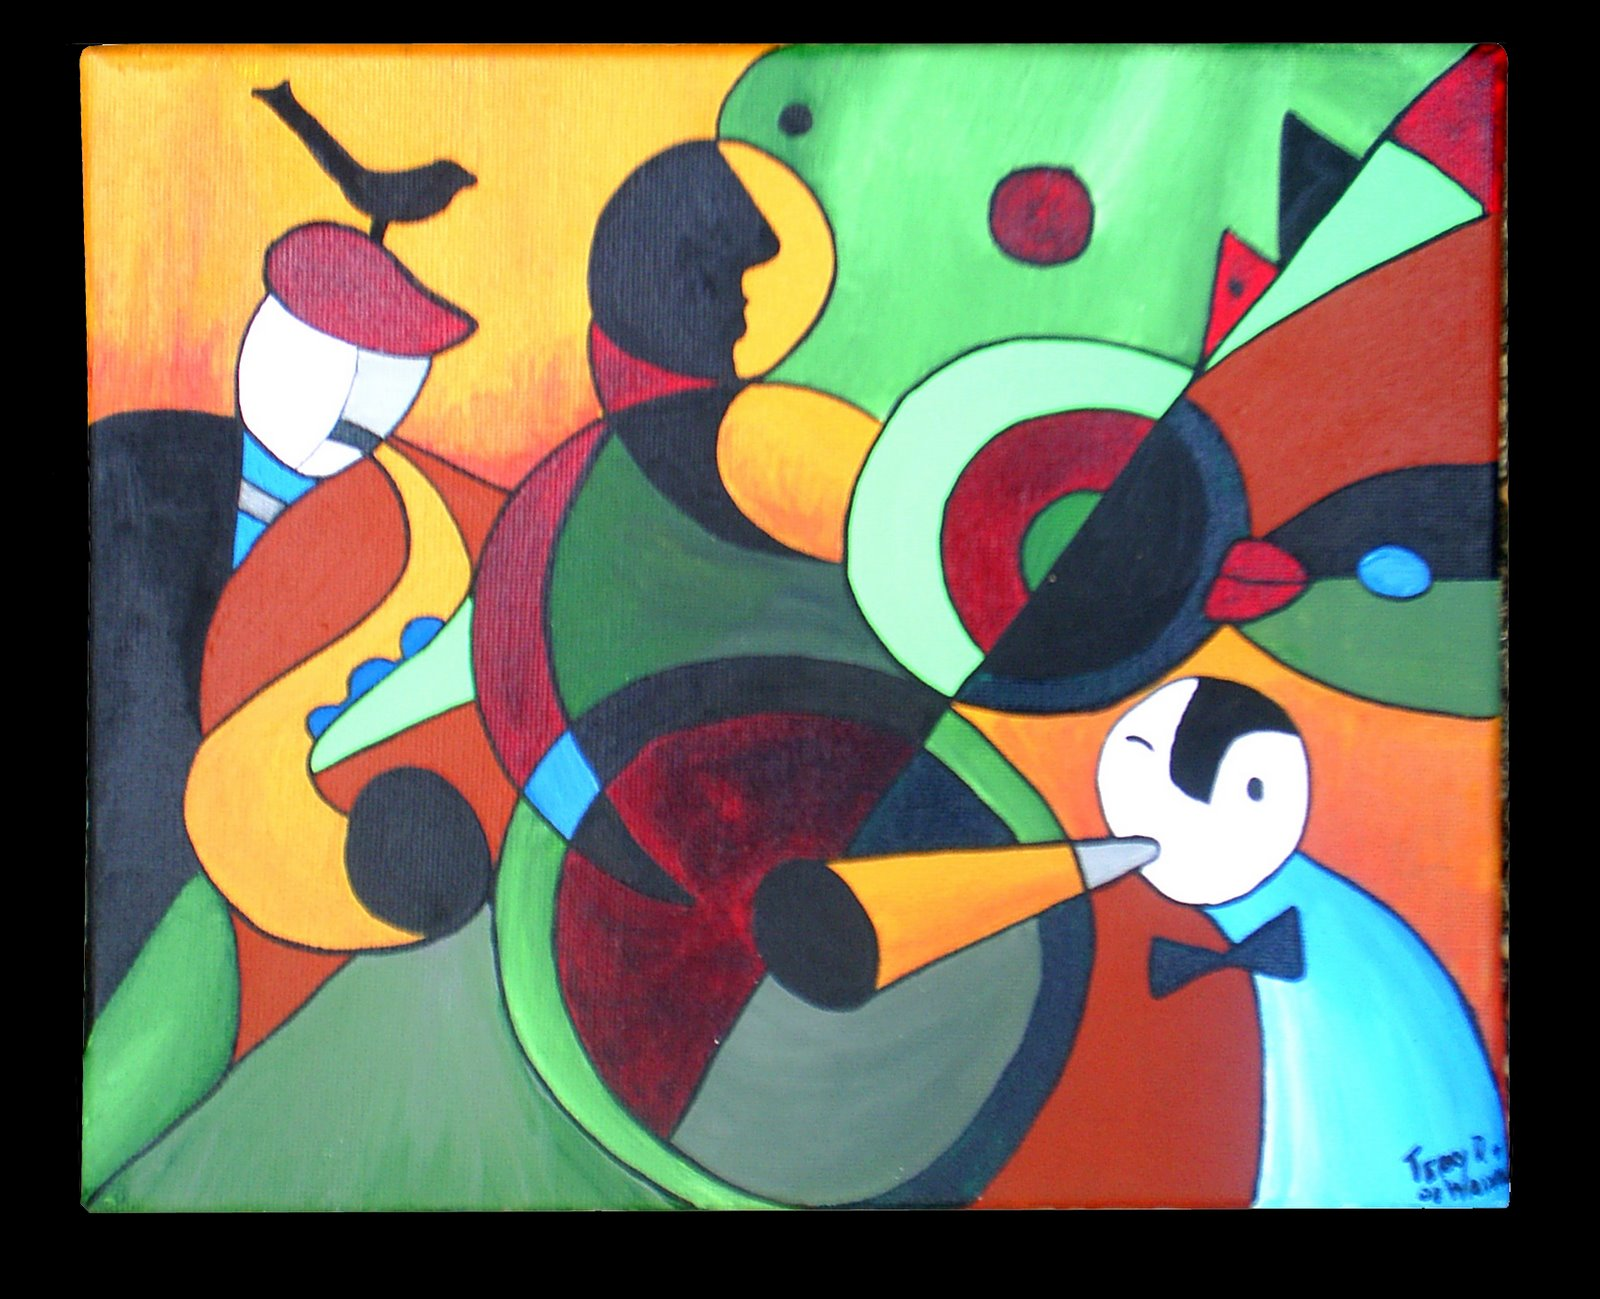 3 Piece Jazz Terrydoesart